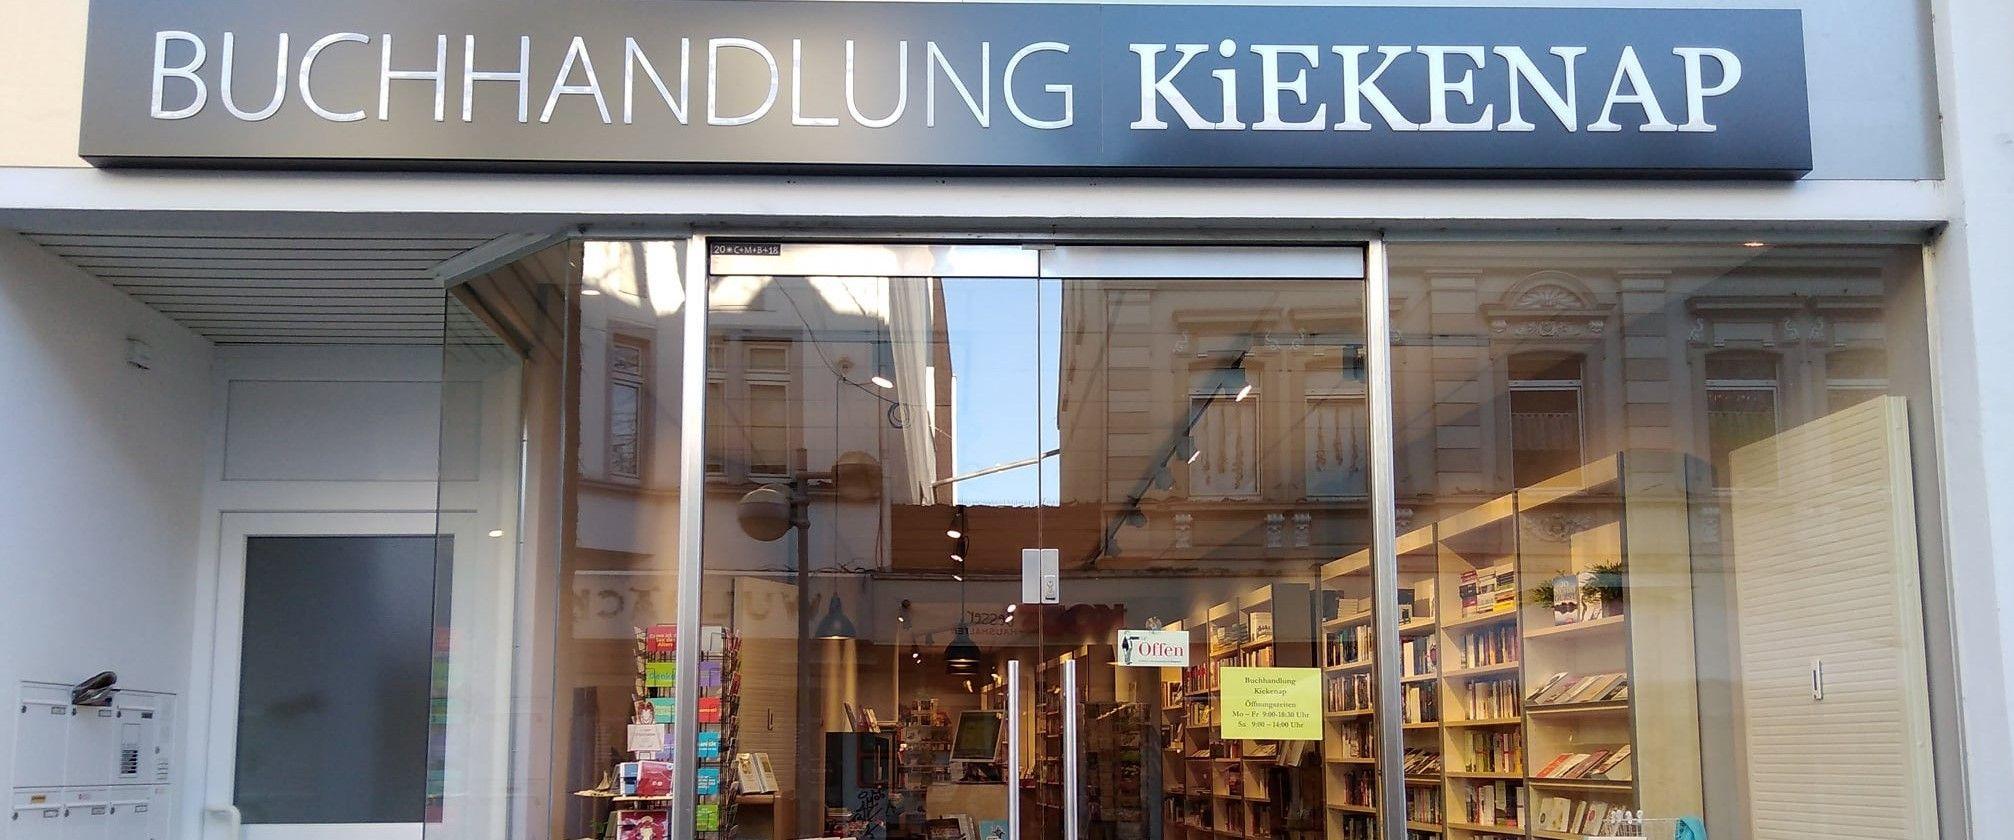 Buchhandlung Kiekenap | ISG Solingen-Ohligs e.V.